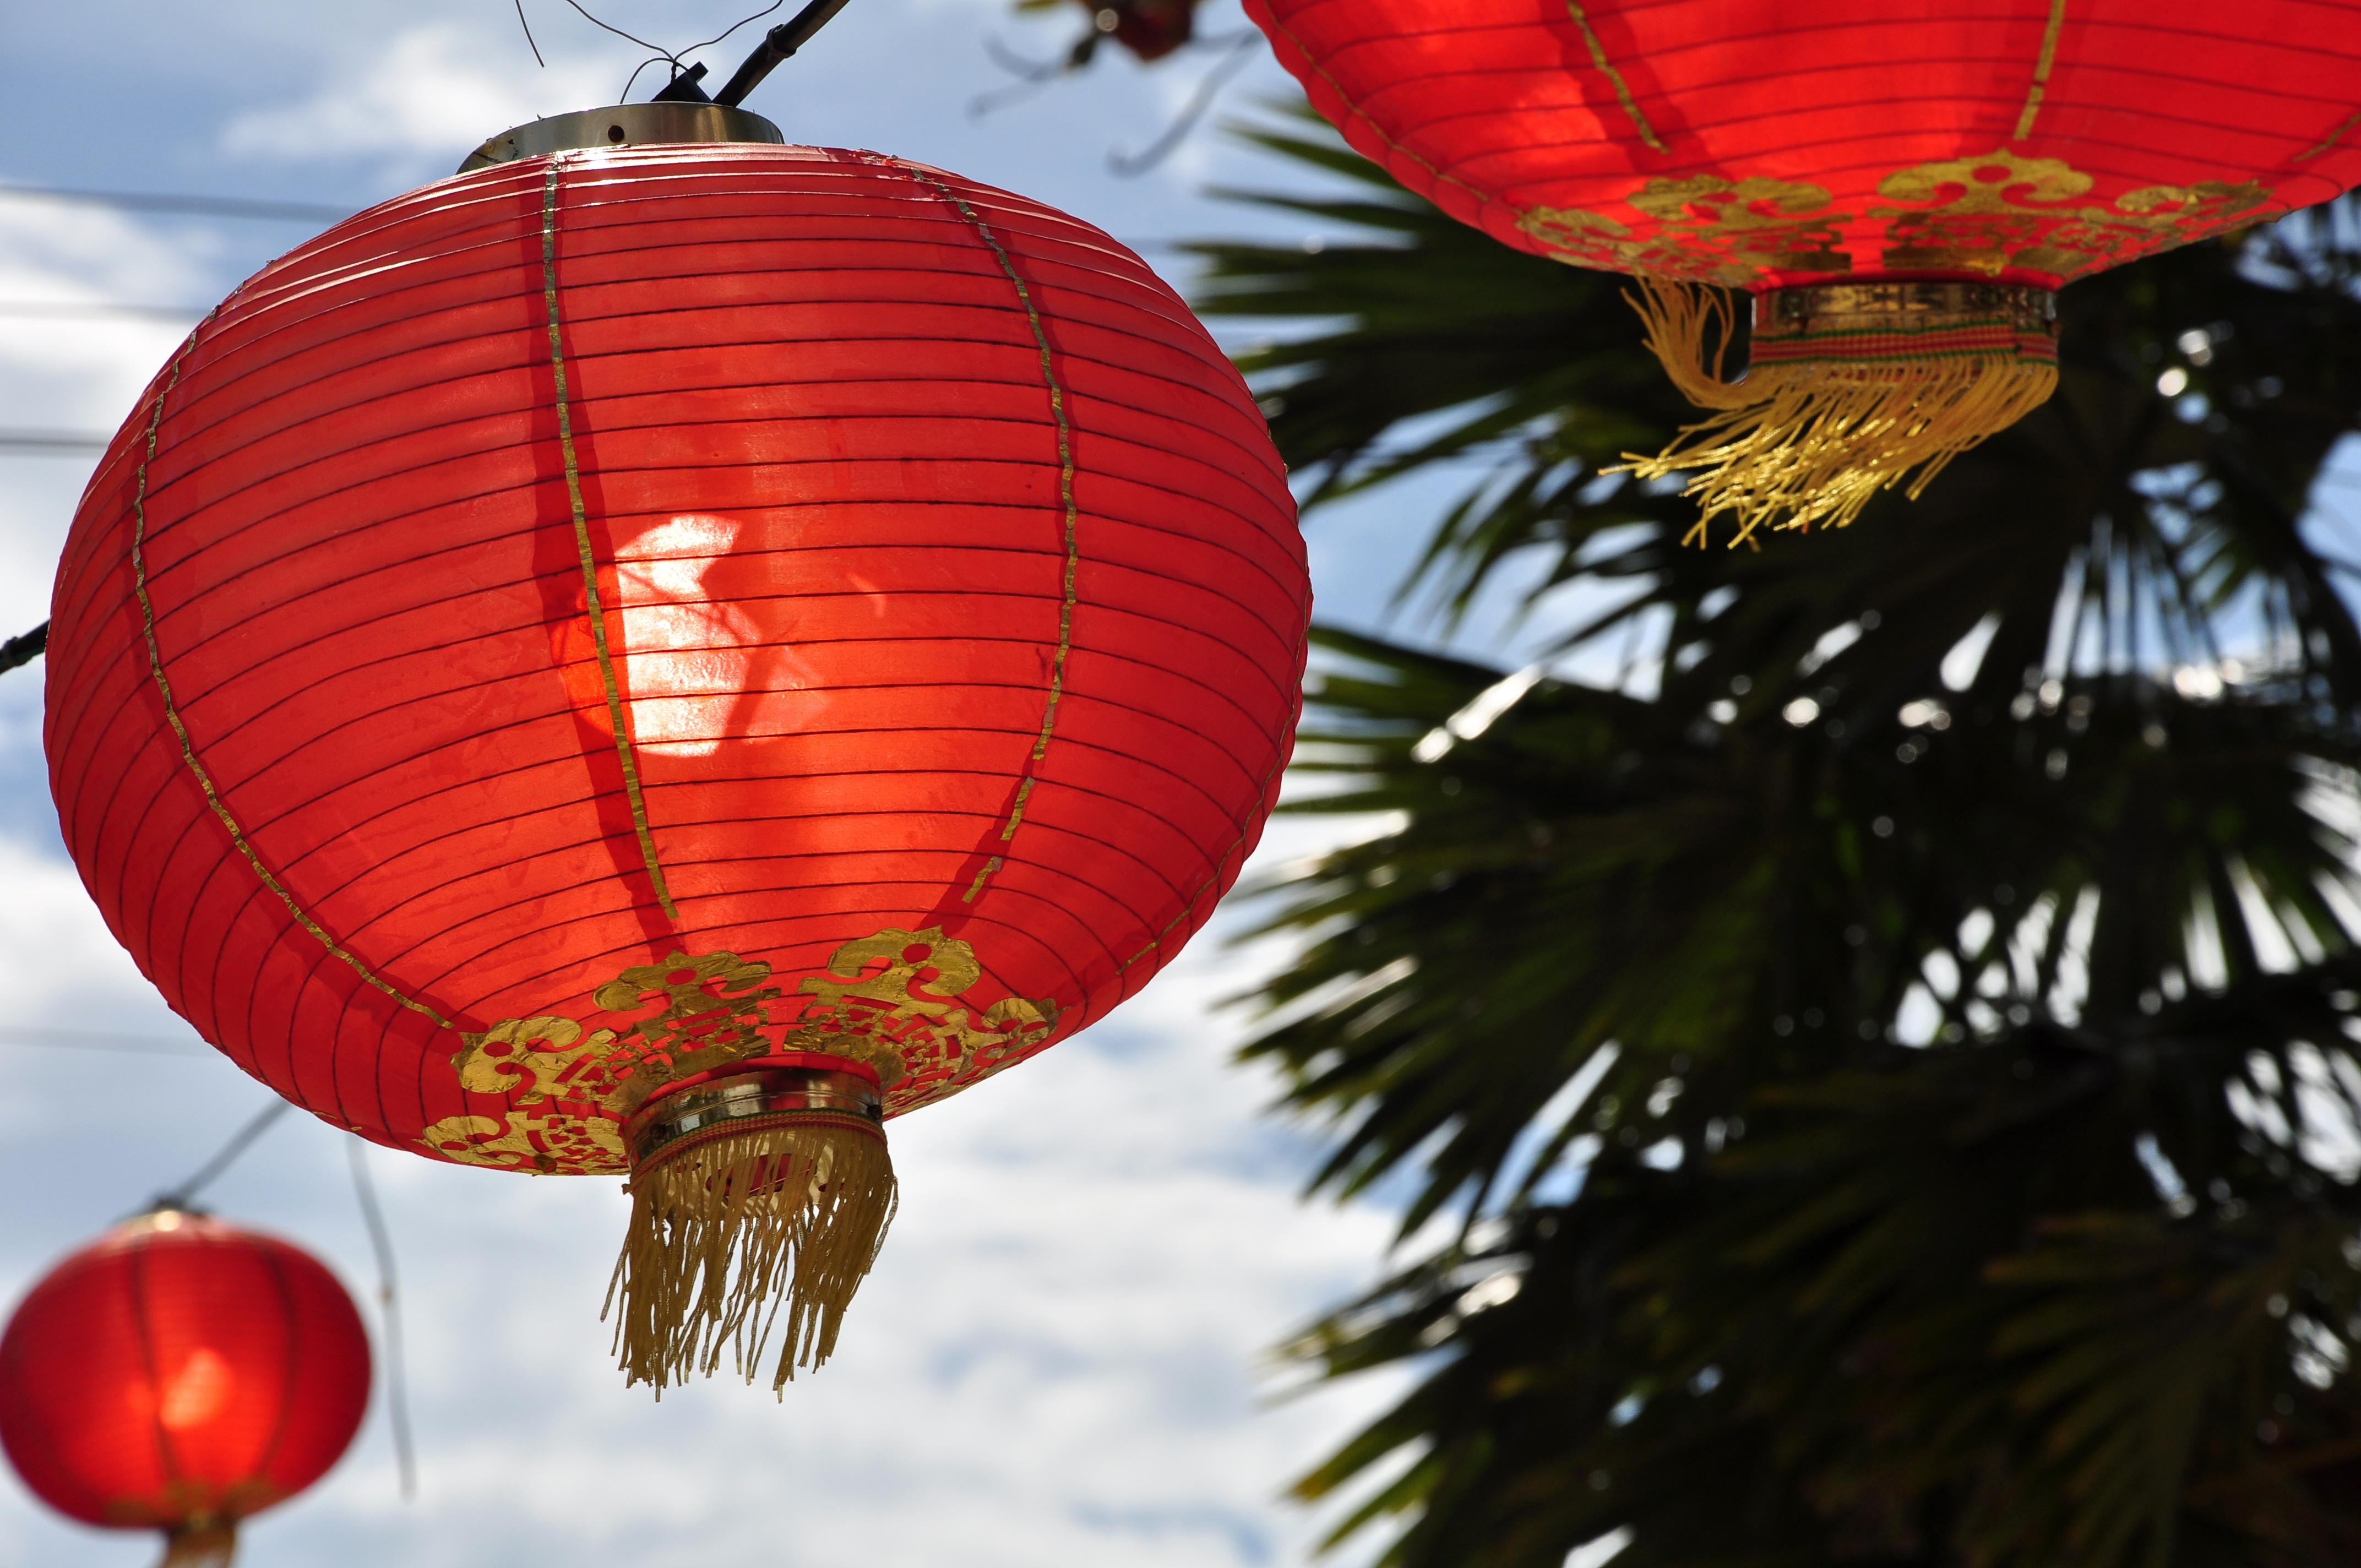 filered lanterns for chinese new year kk 3jpg - Chinese New Year Lantern